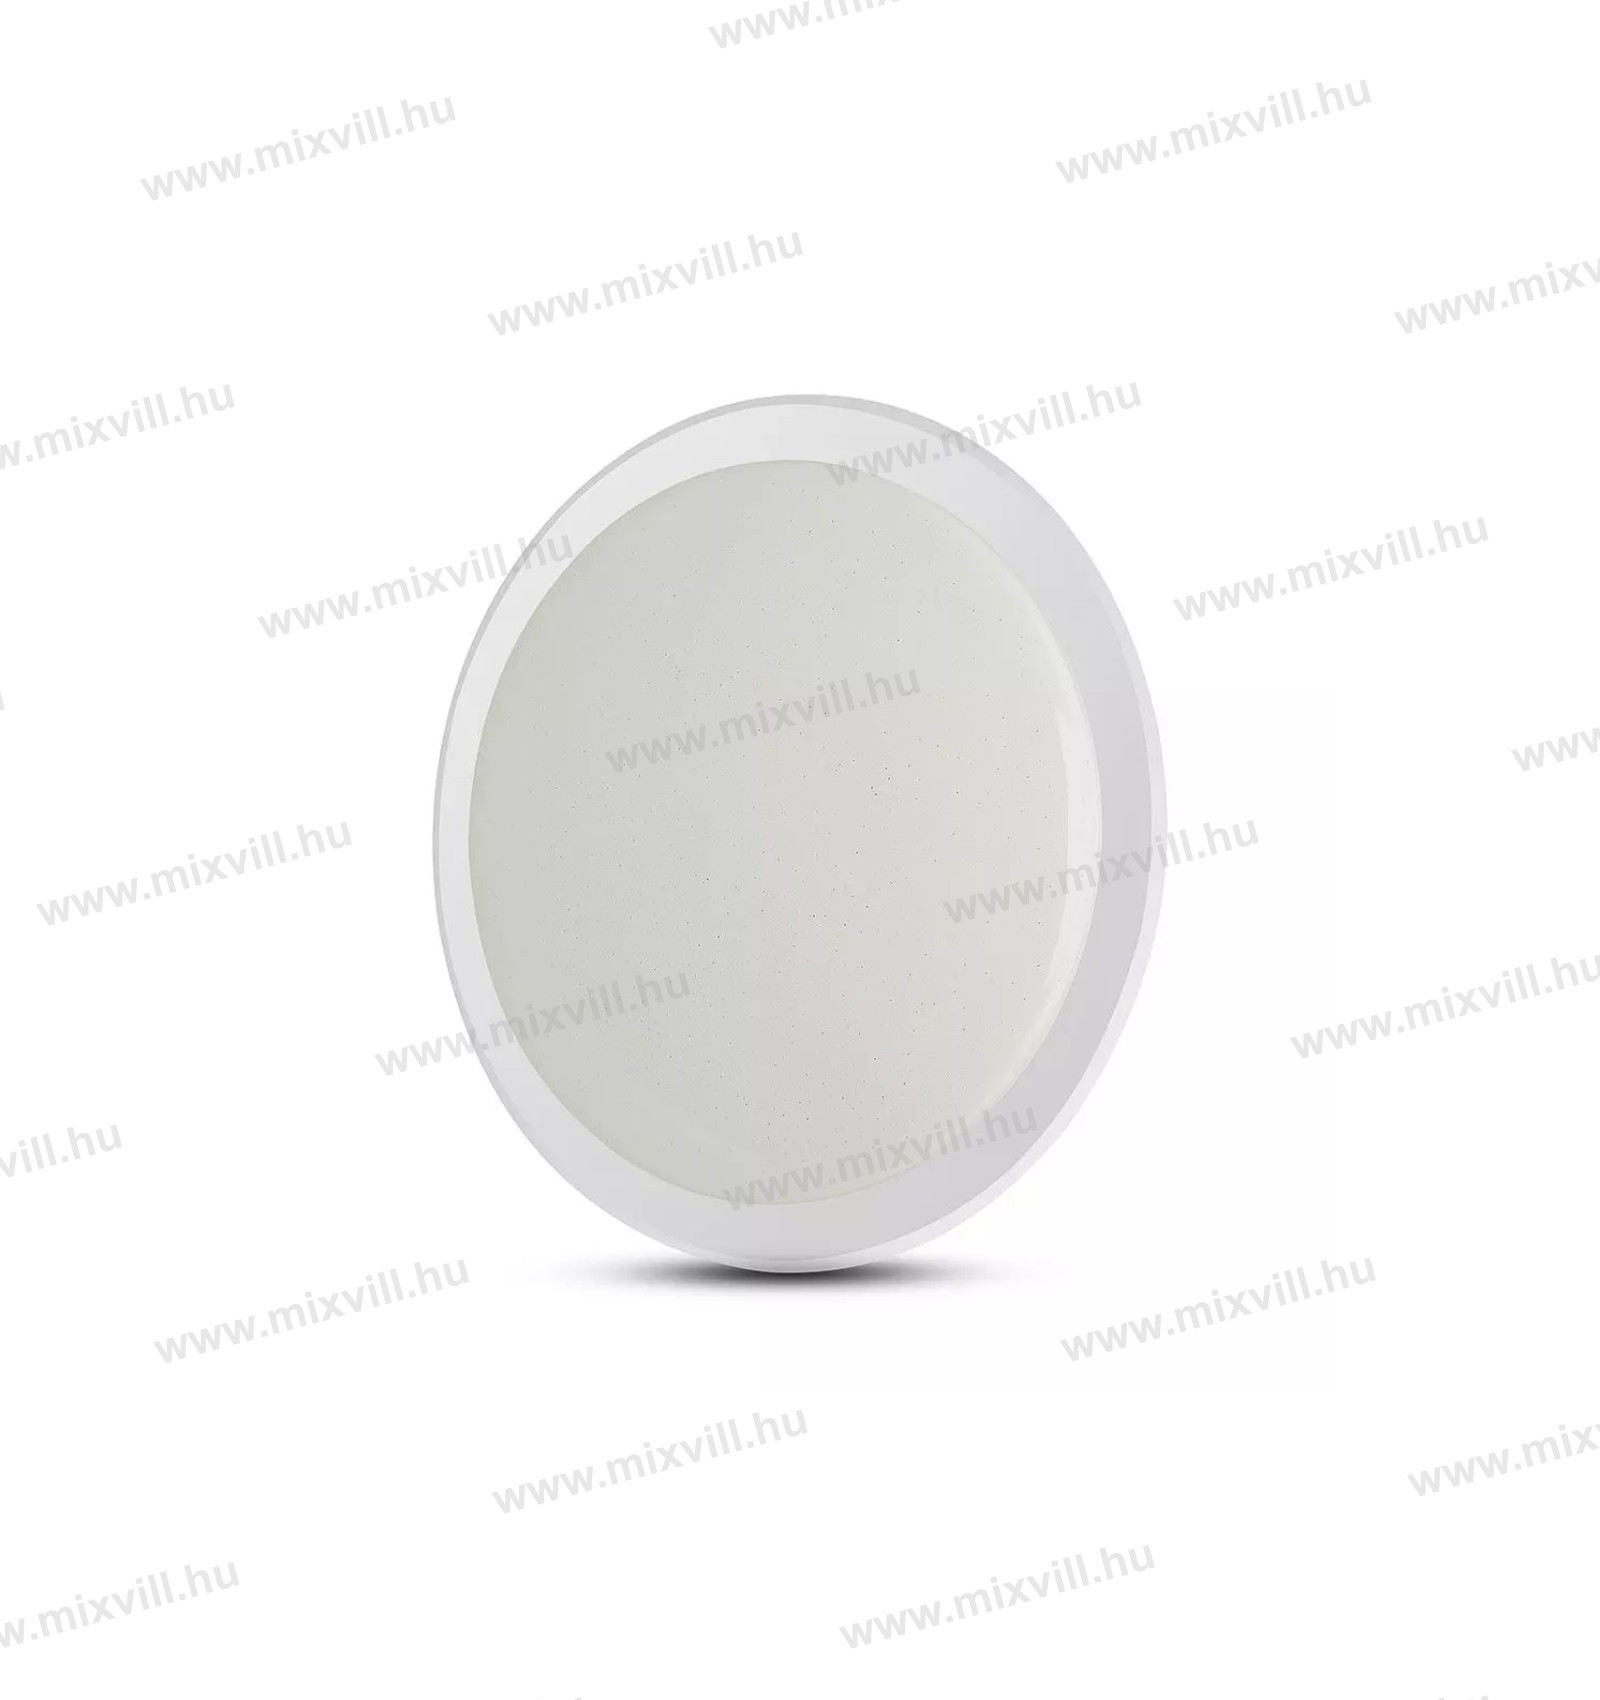 V-TAC-SKU-14551-Led-designer-mennyezeti-lampa-taviranyito-60W-IP20-fényszin-valtoztat